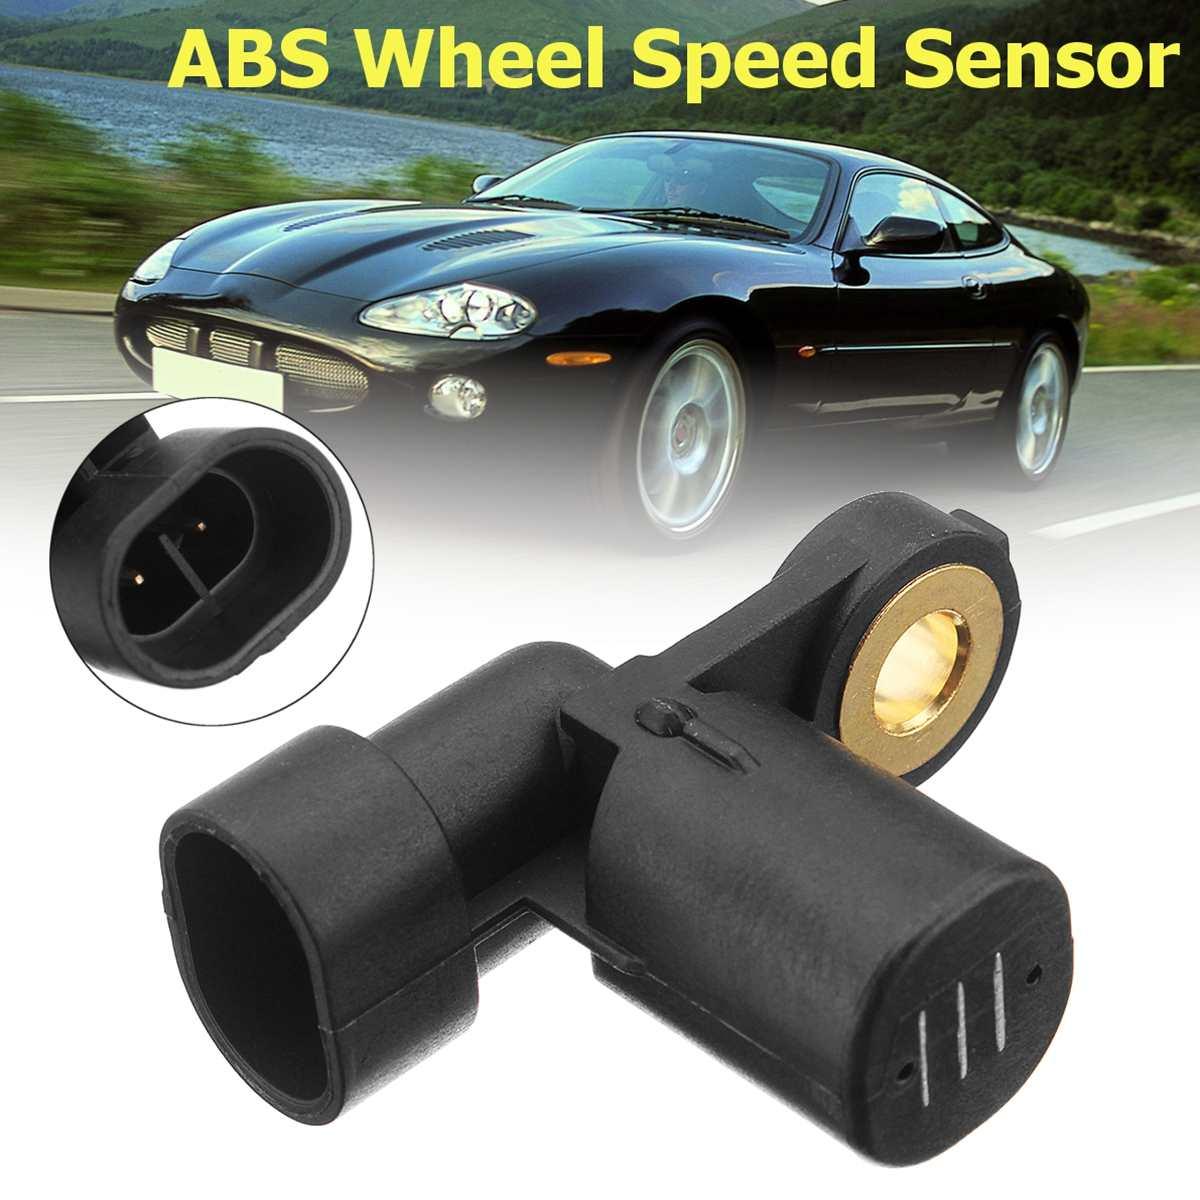 ABS SENSOR WHEEL SPEED SENSOR Jaguar S-Type XK8 XKR XJ6 XJ8 XJ X350